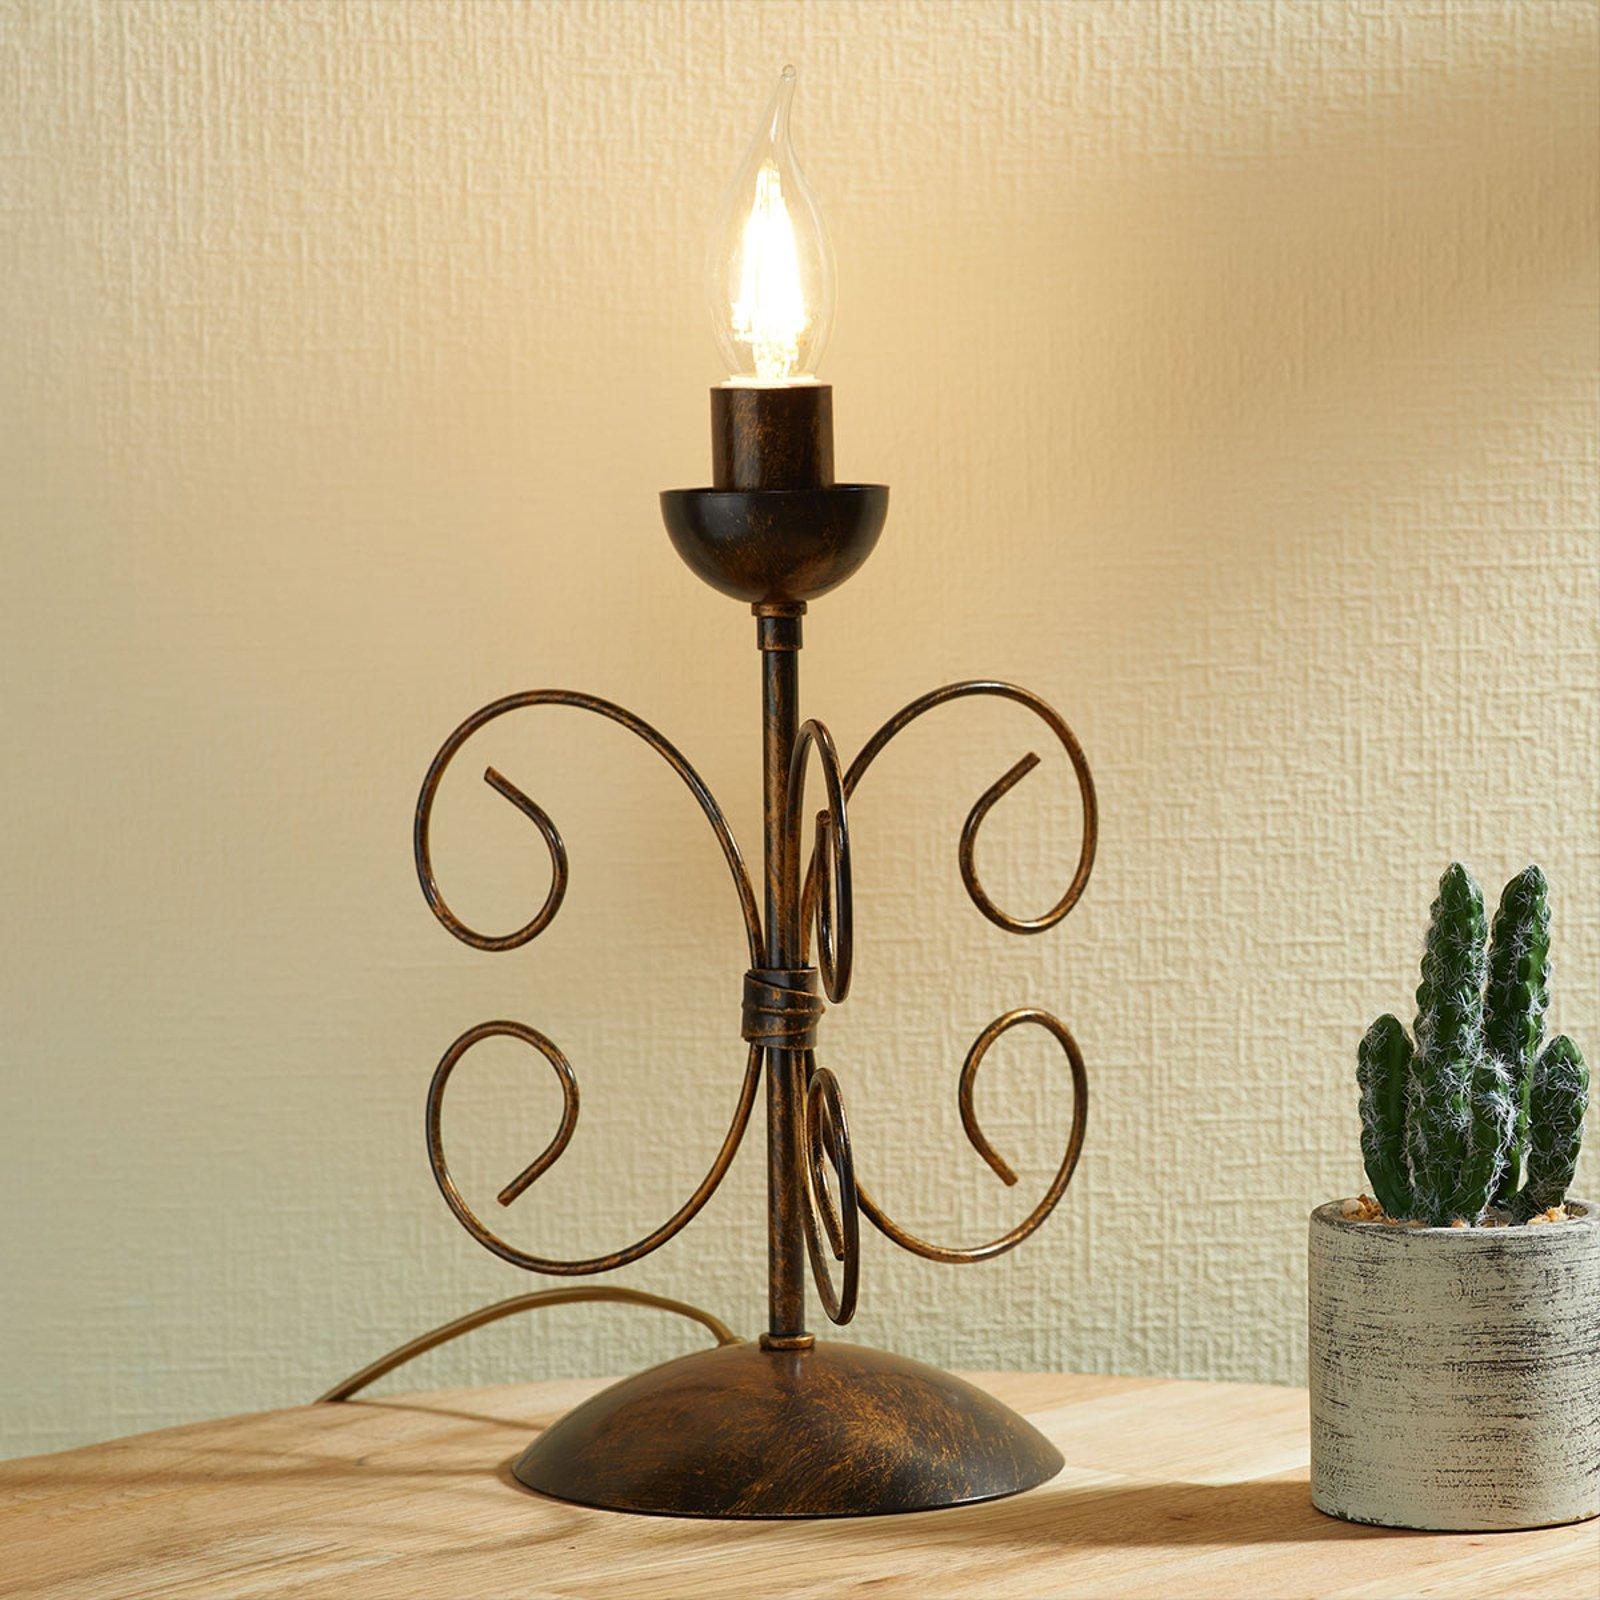 Bordlampe Ennio, antikt gull